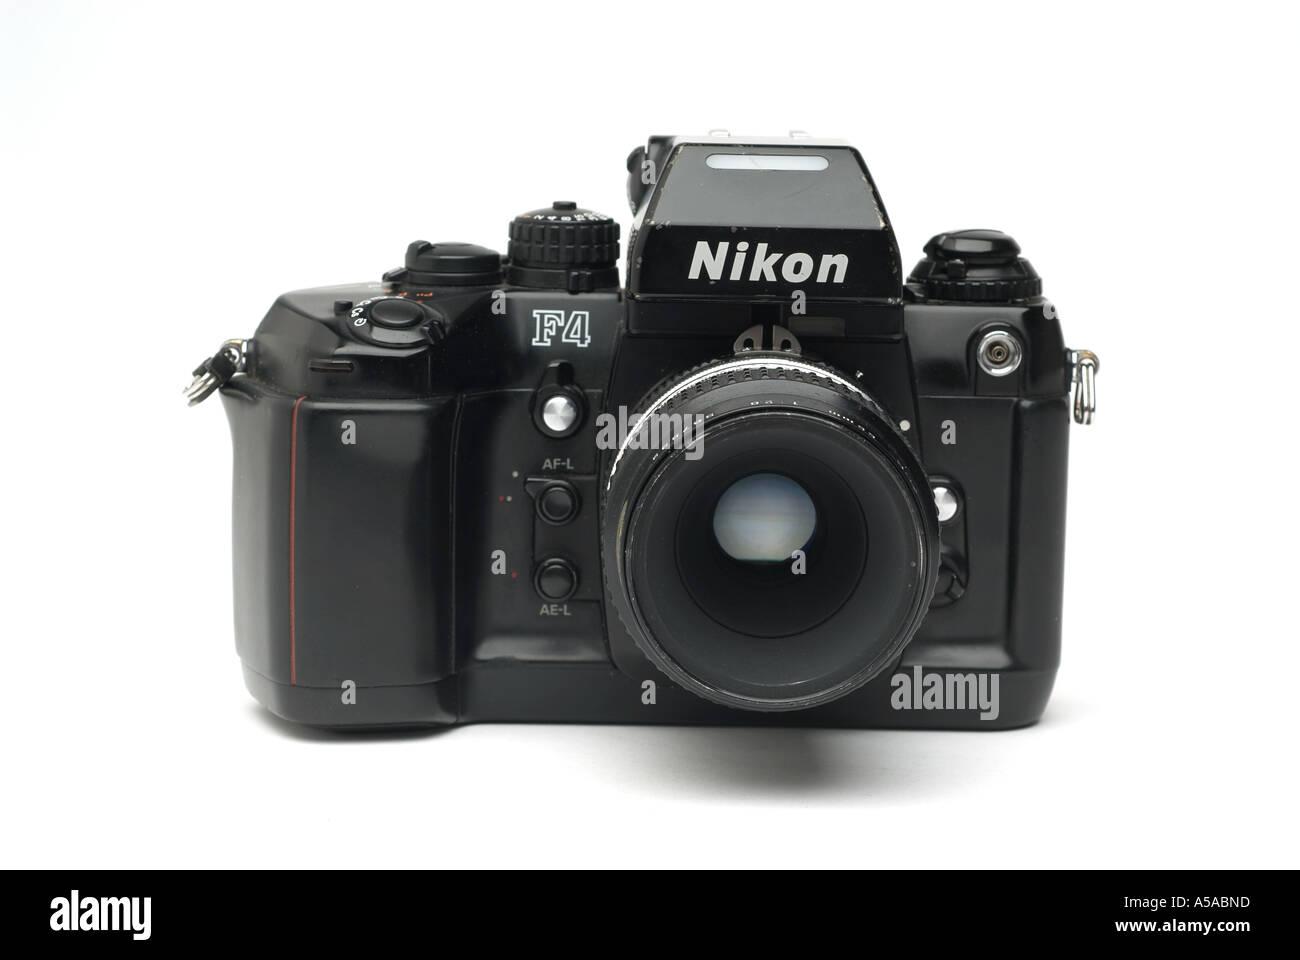 nikon f4 35mm film camera stock photos nikon f4 35mm film camera rh alamy com Nikon 300Mm F4 Nikon 300Mm F4